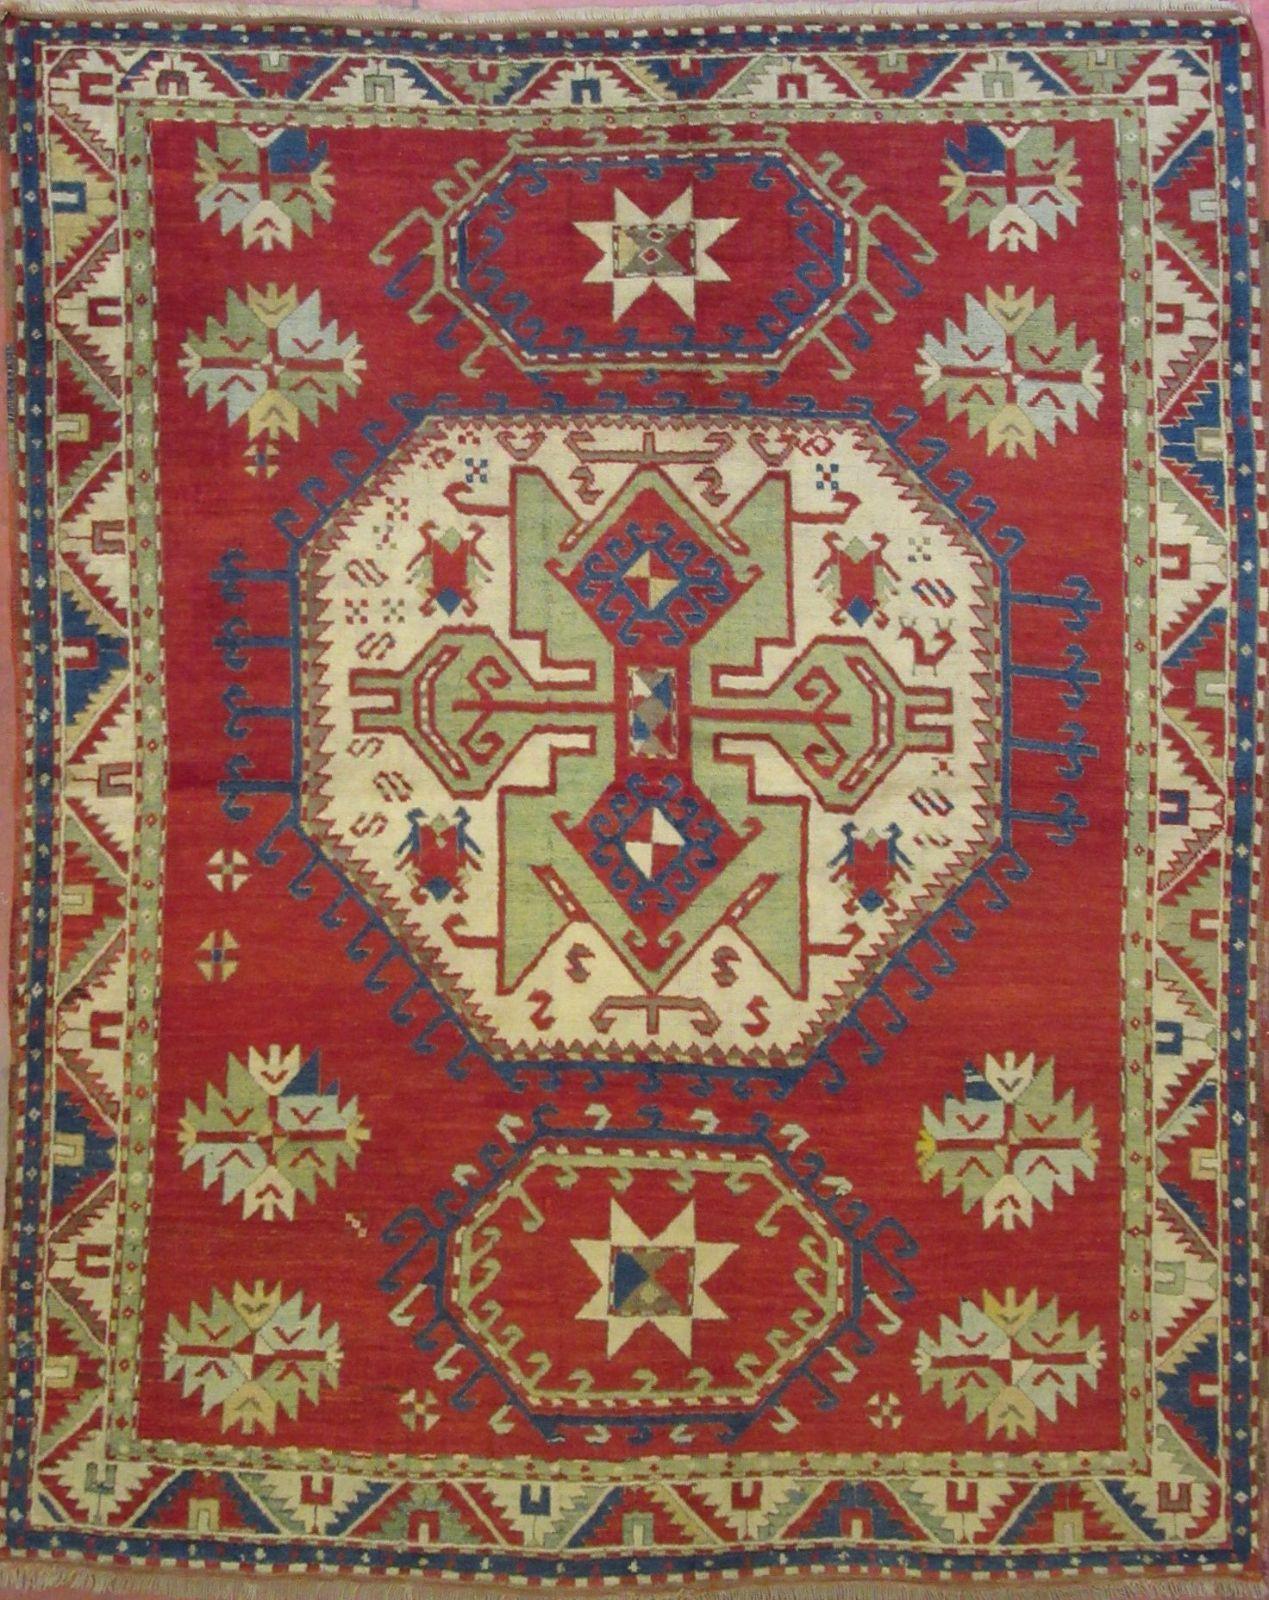 N. 206074 – kAZAK ( LORIPAMPAK) ANTICO – 228 x 180 cm. – Tappeti ...